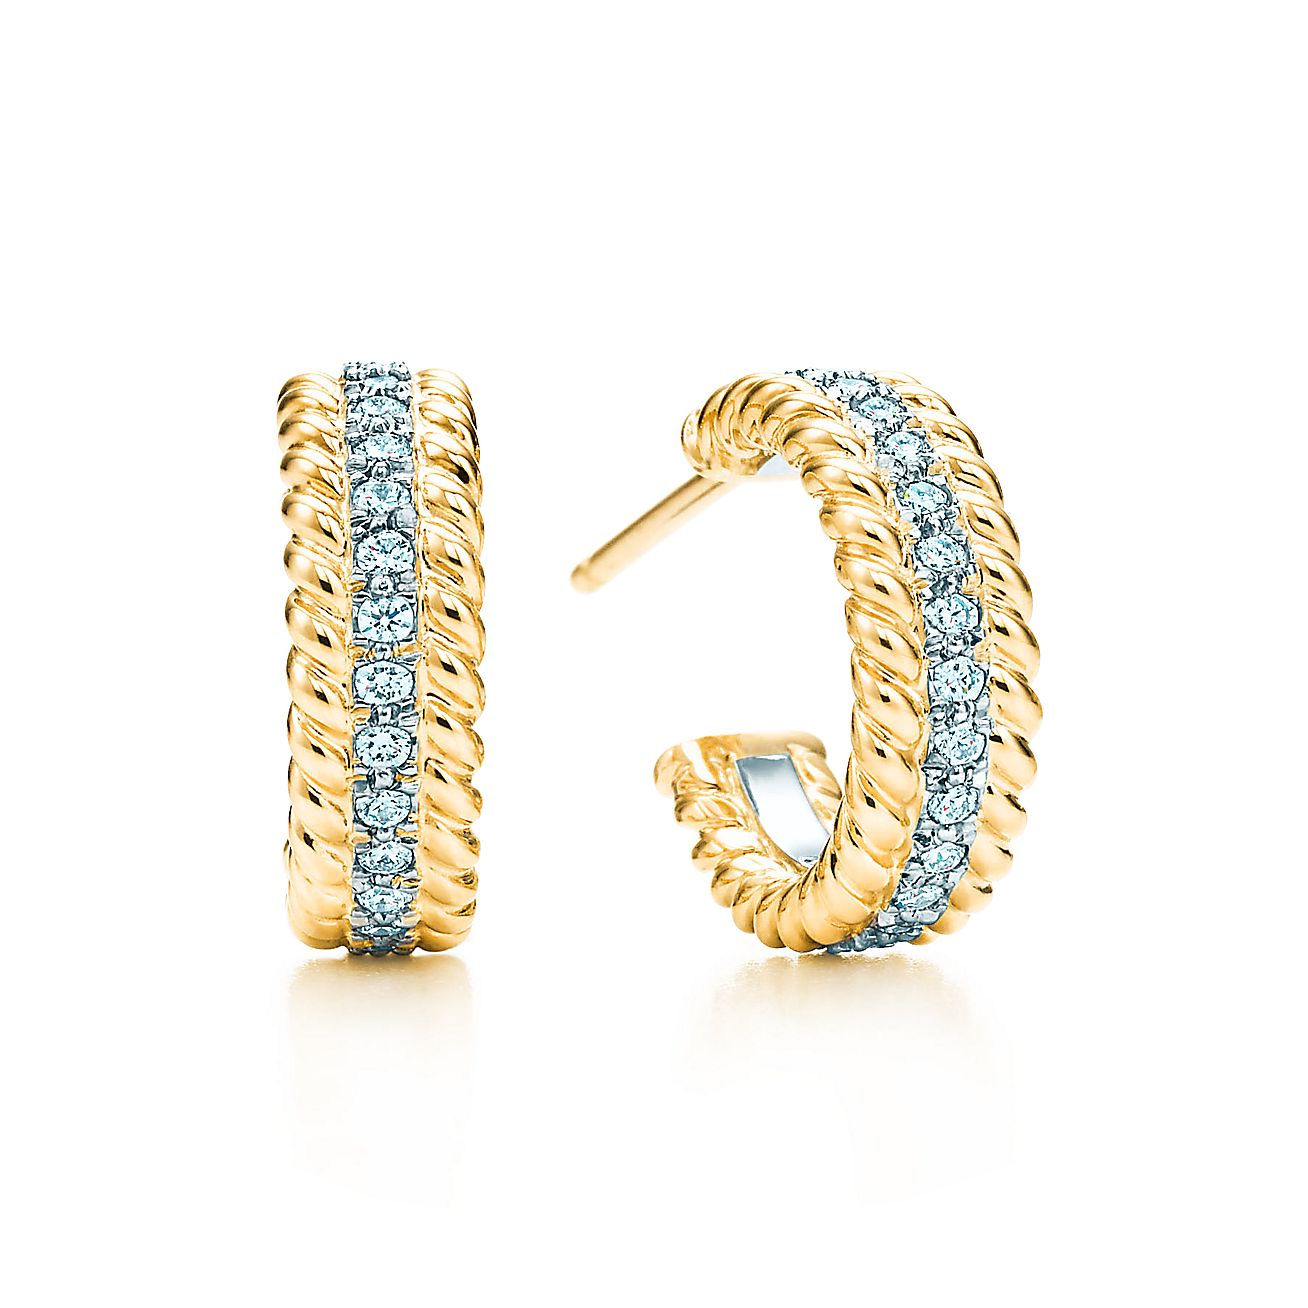 Tiffany & Co. Schlumberger®:Rope Two-row Hoop Earrings